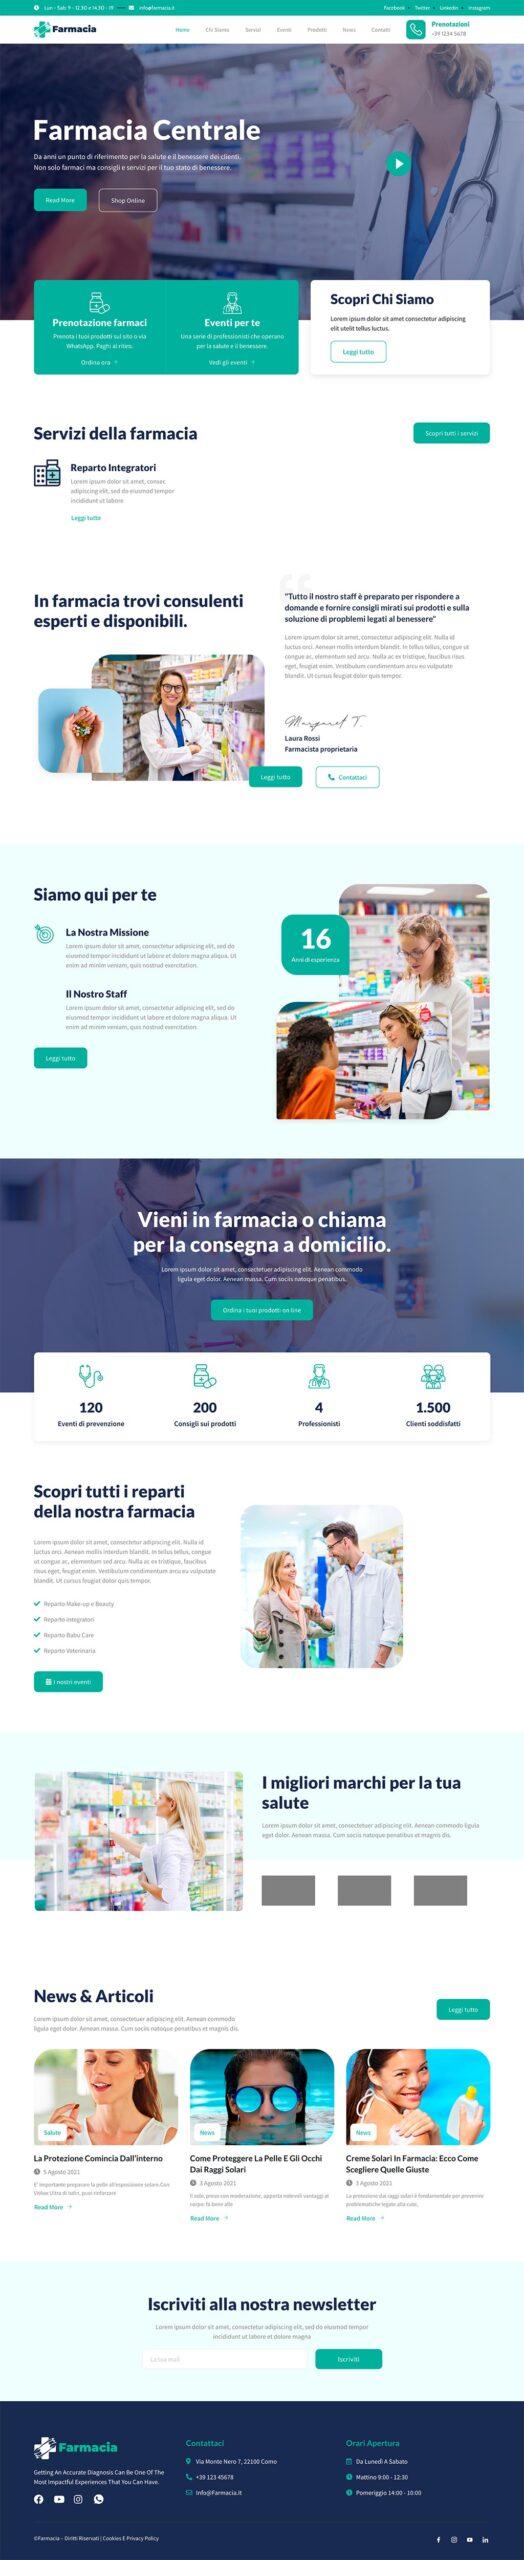 farmacia evoluta next generation - topazio